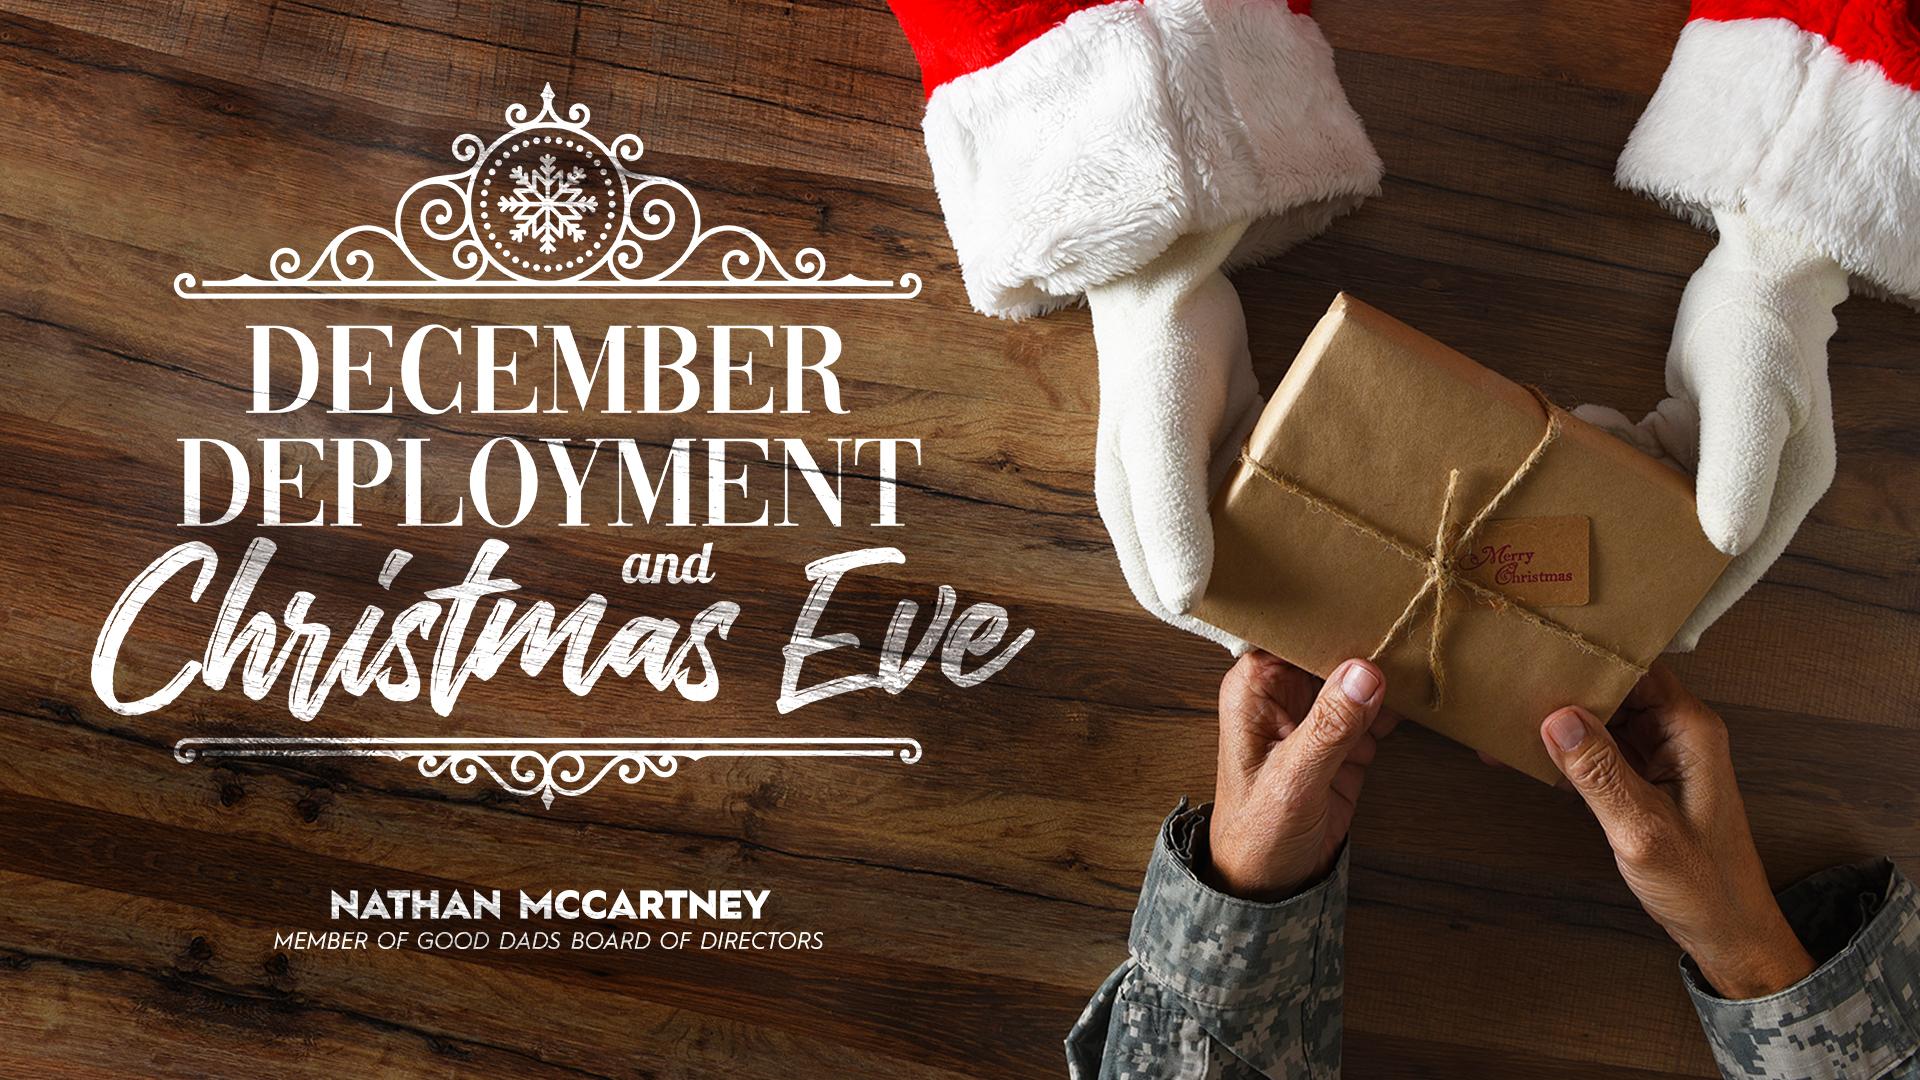 DECEMBER DEPLOYMENT & CHRISTMAS EVE